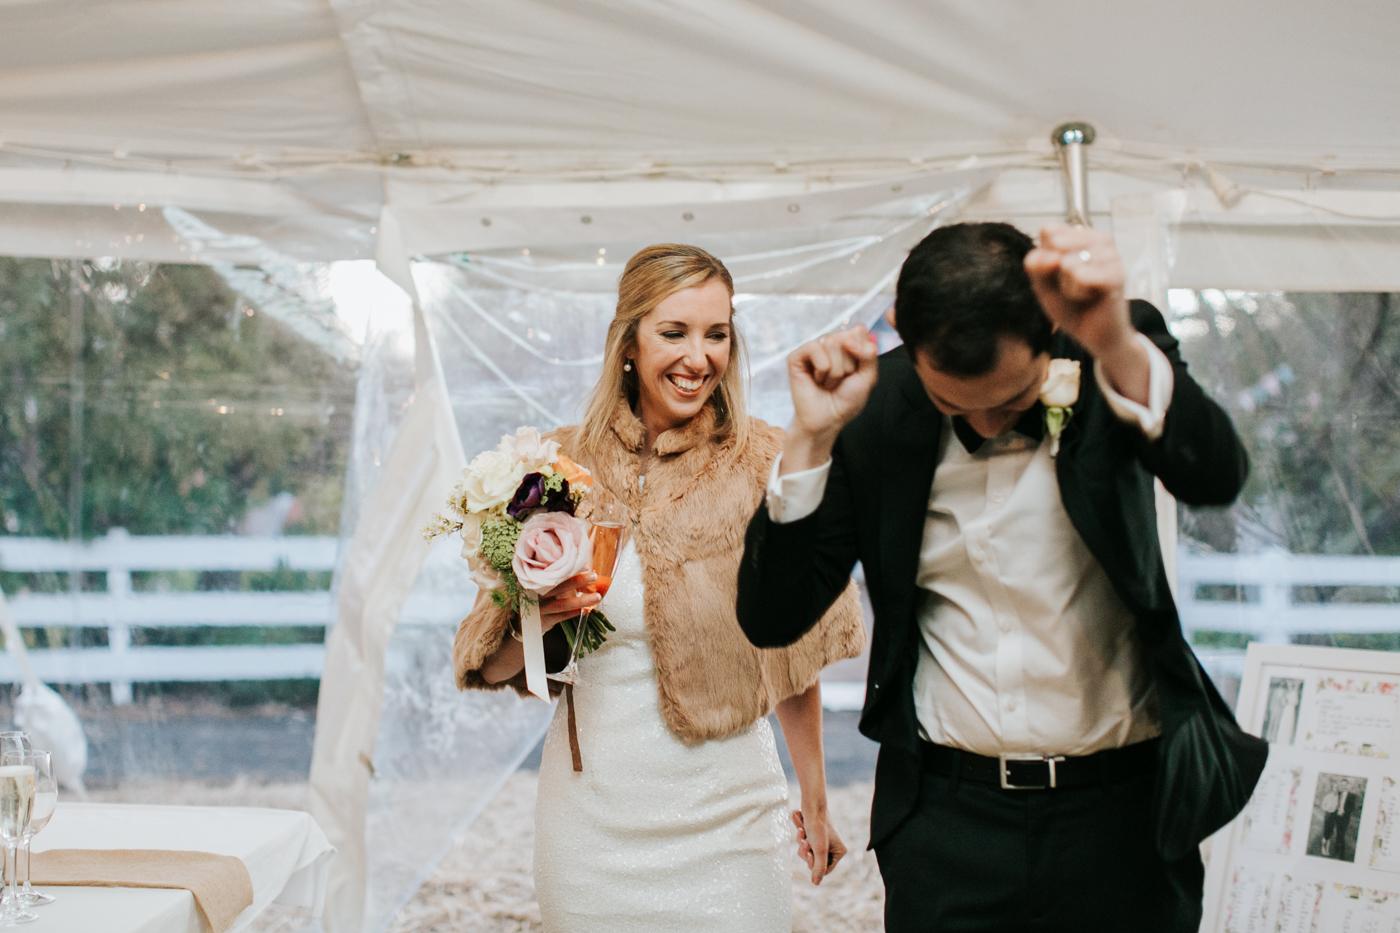 Bridget & James - Orange Country Wedding - Samantha Heather Photography-202.jpg